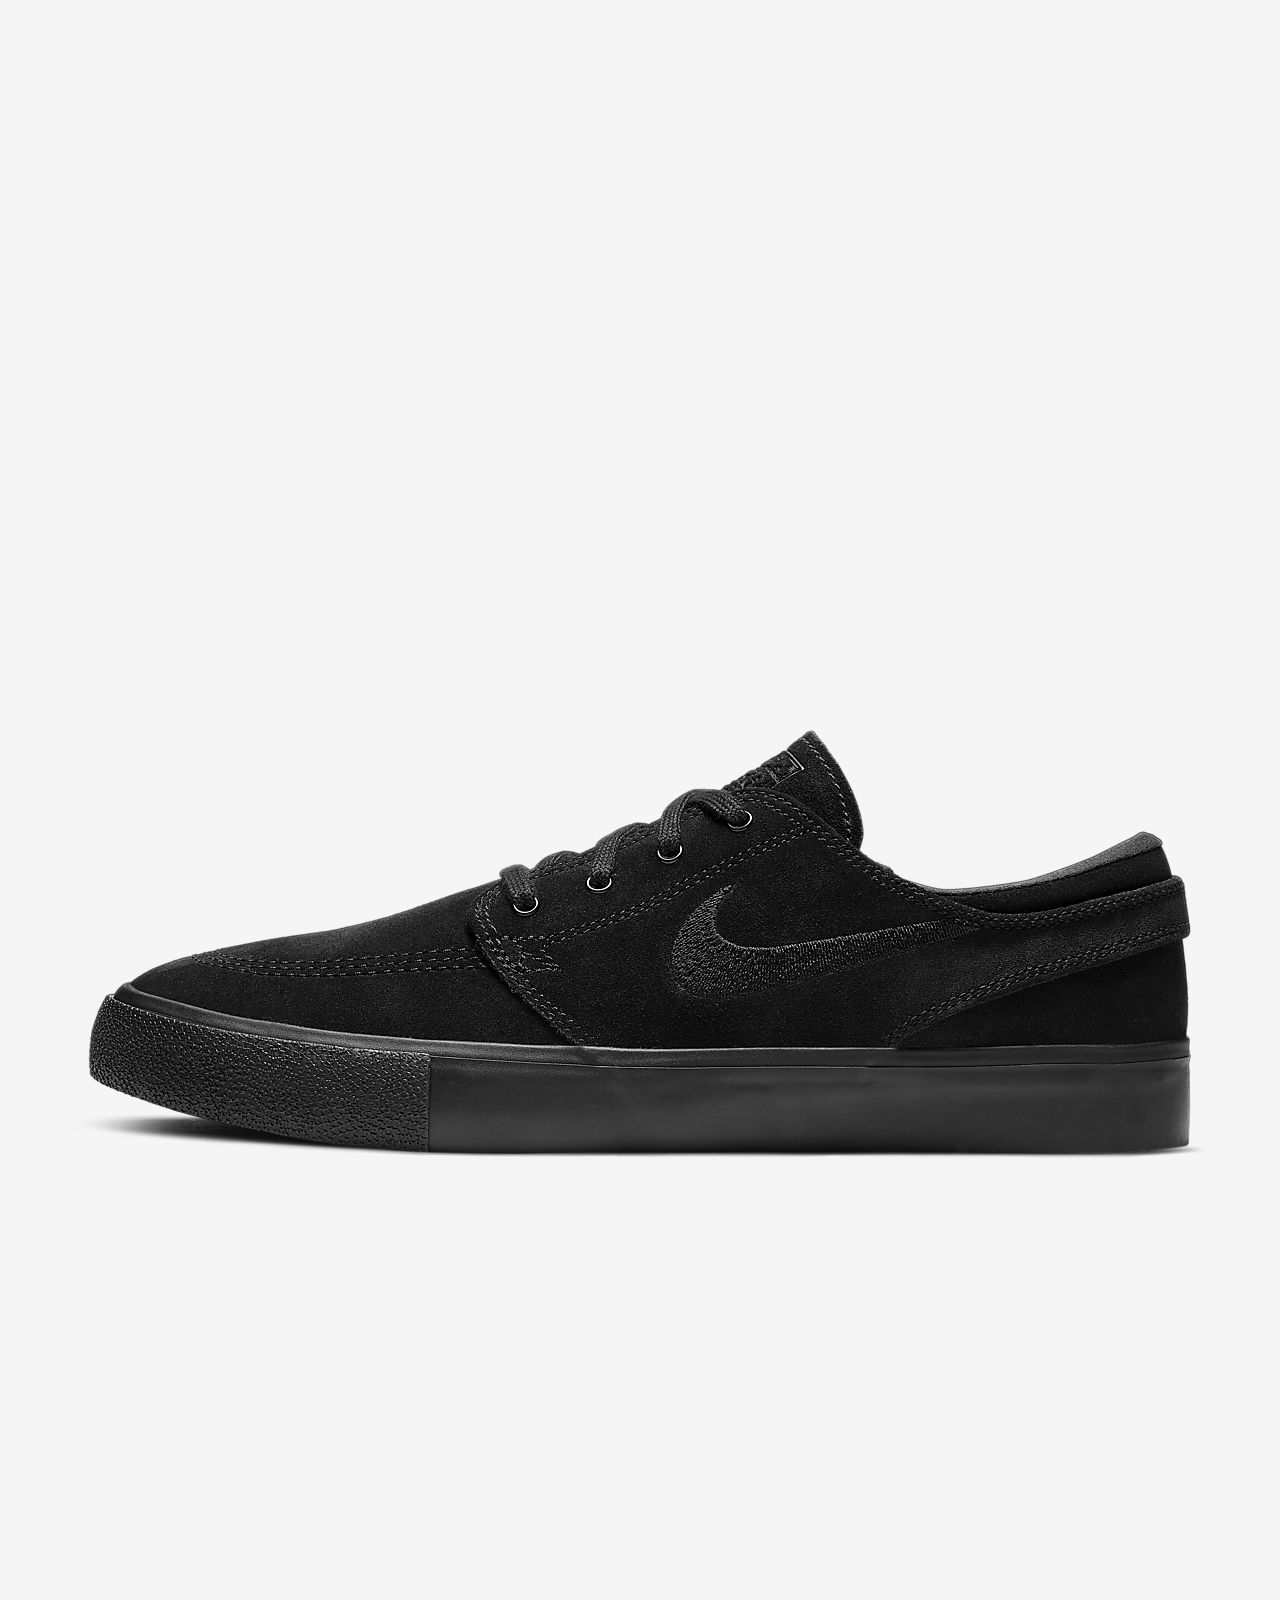 Nike SB Herren Schuhe Sneaker Air Zoom Stefan Janoski